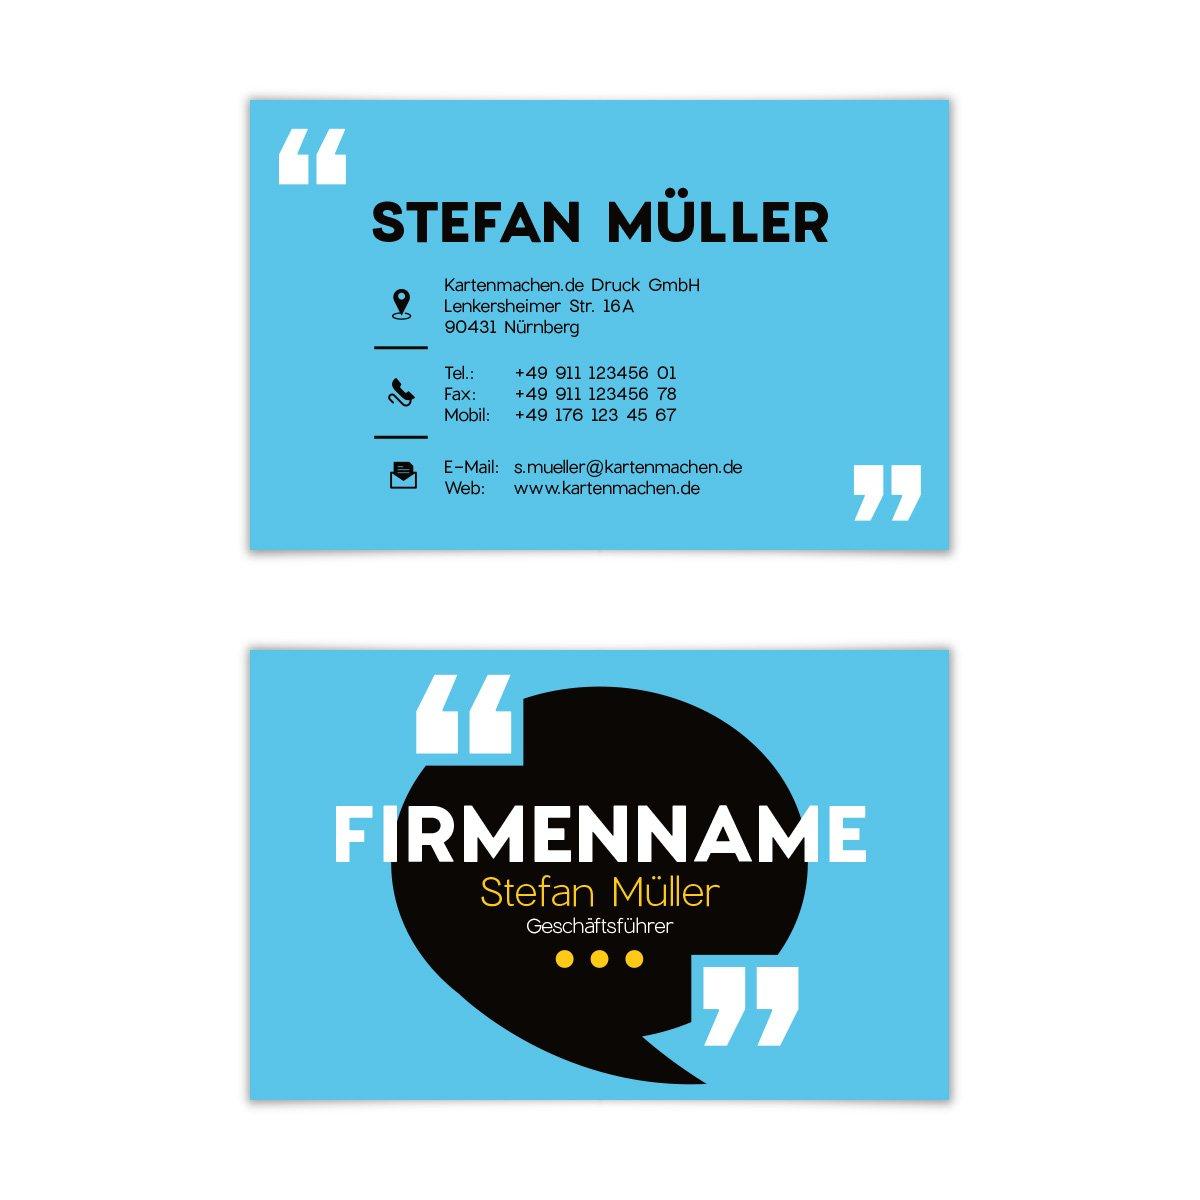 500 x Visitenkarten individuell Business Karten 300g qm 85 x 55 mm - rotakteur B07F7CJTDX | Zahlreiche In Vielfalt  | Marke  | Zart